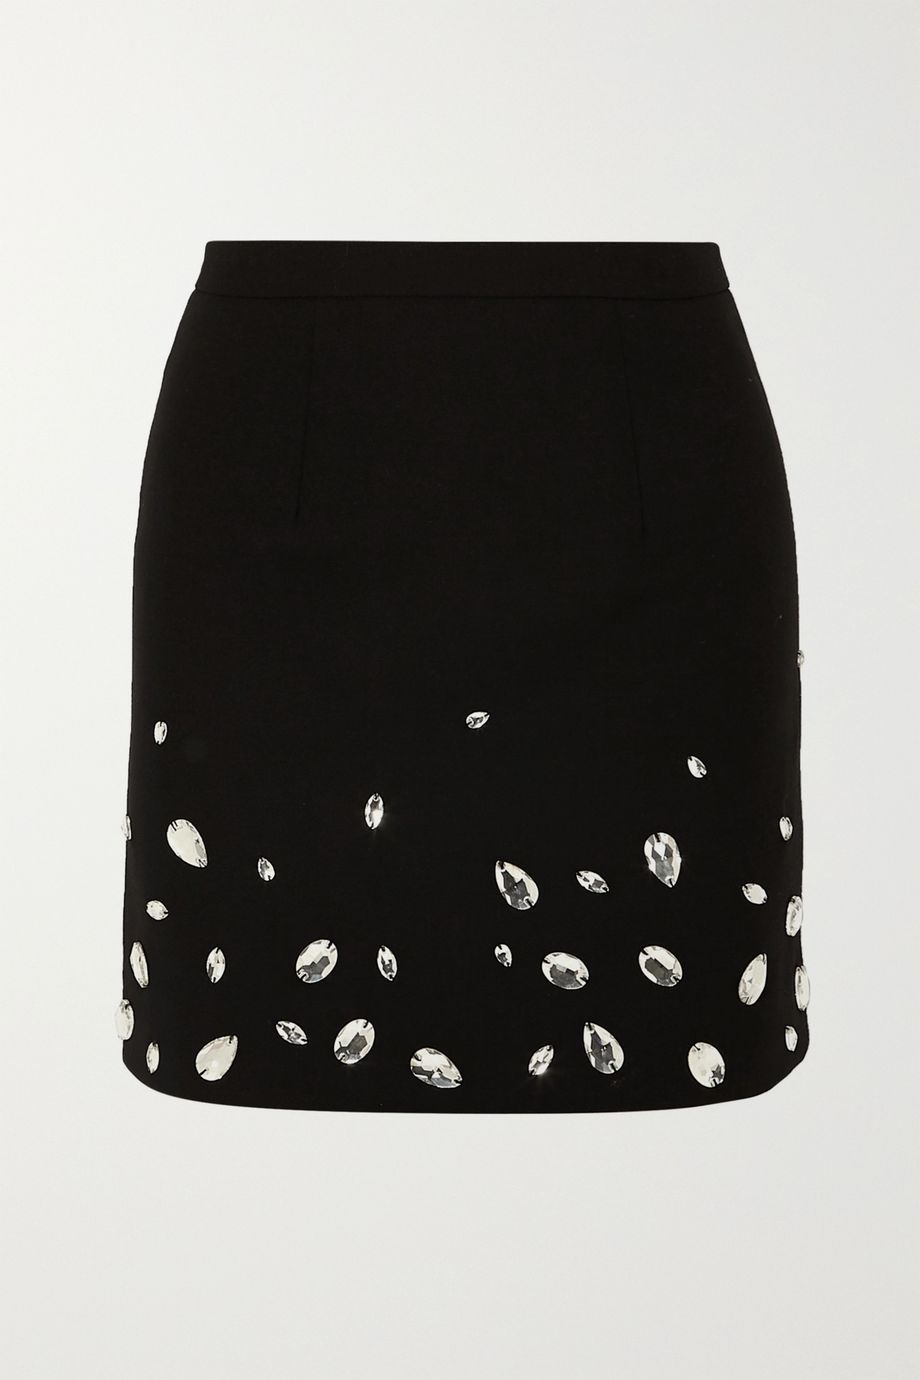 Christopher Kane Crystal-embellished cady mini skirt